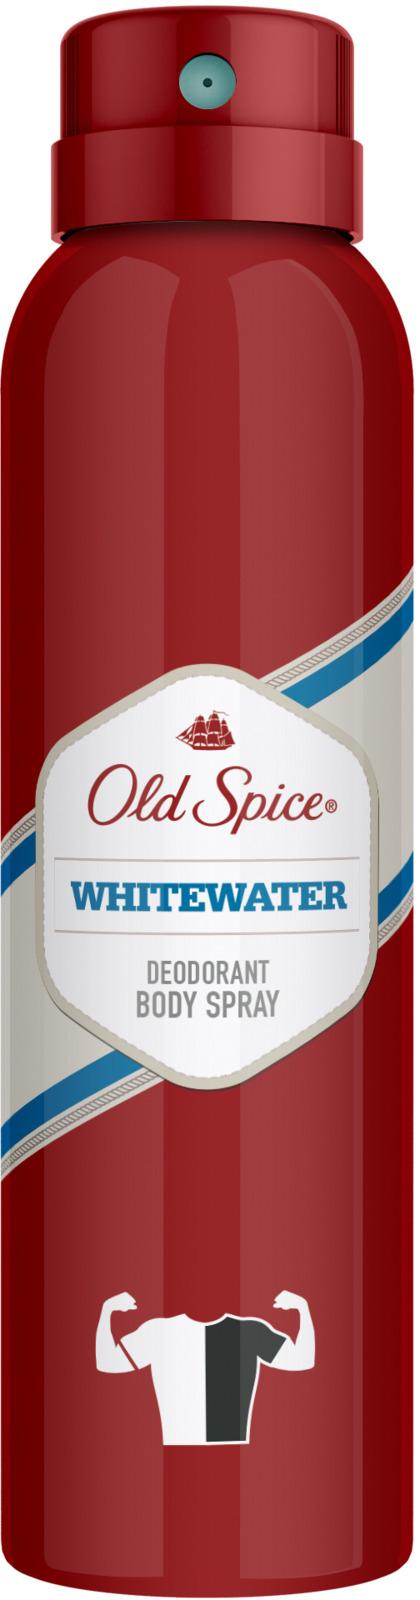 Дезодорант аэрозольный Old Spice WhiteWater, 150 мл